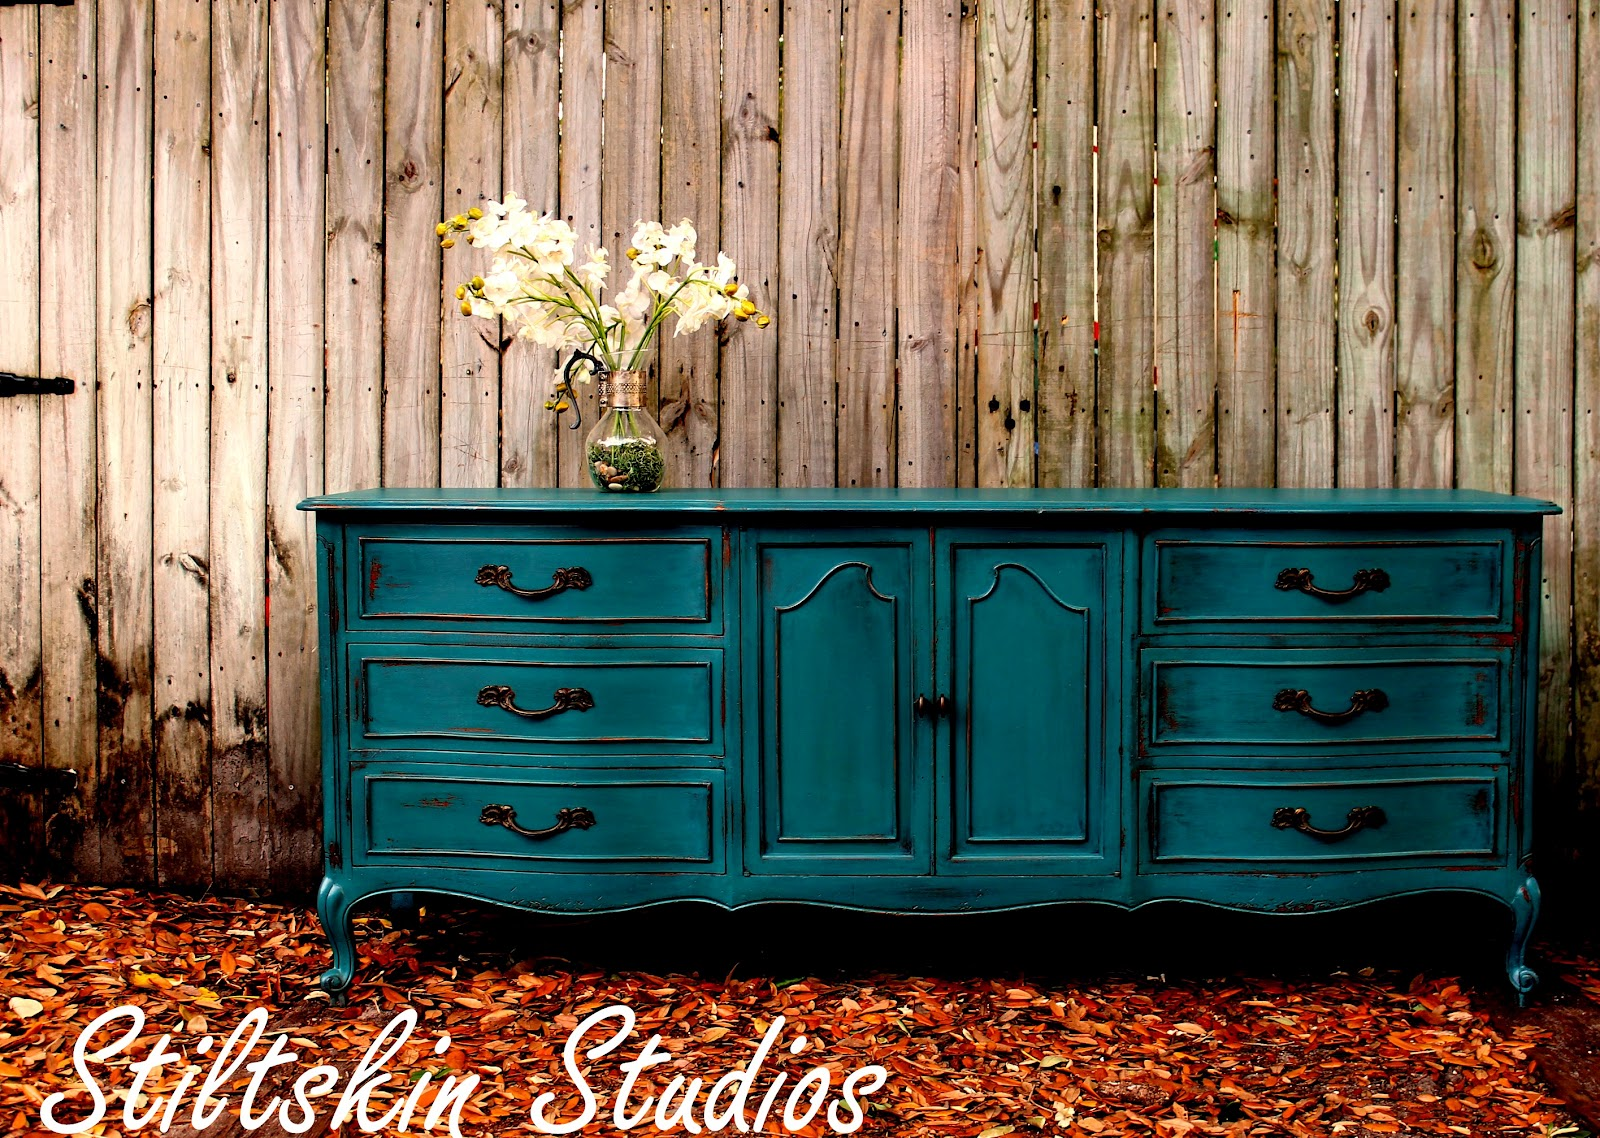 Stiltskin Studios Peacock Blue Dresser